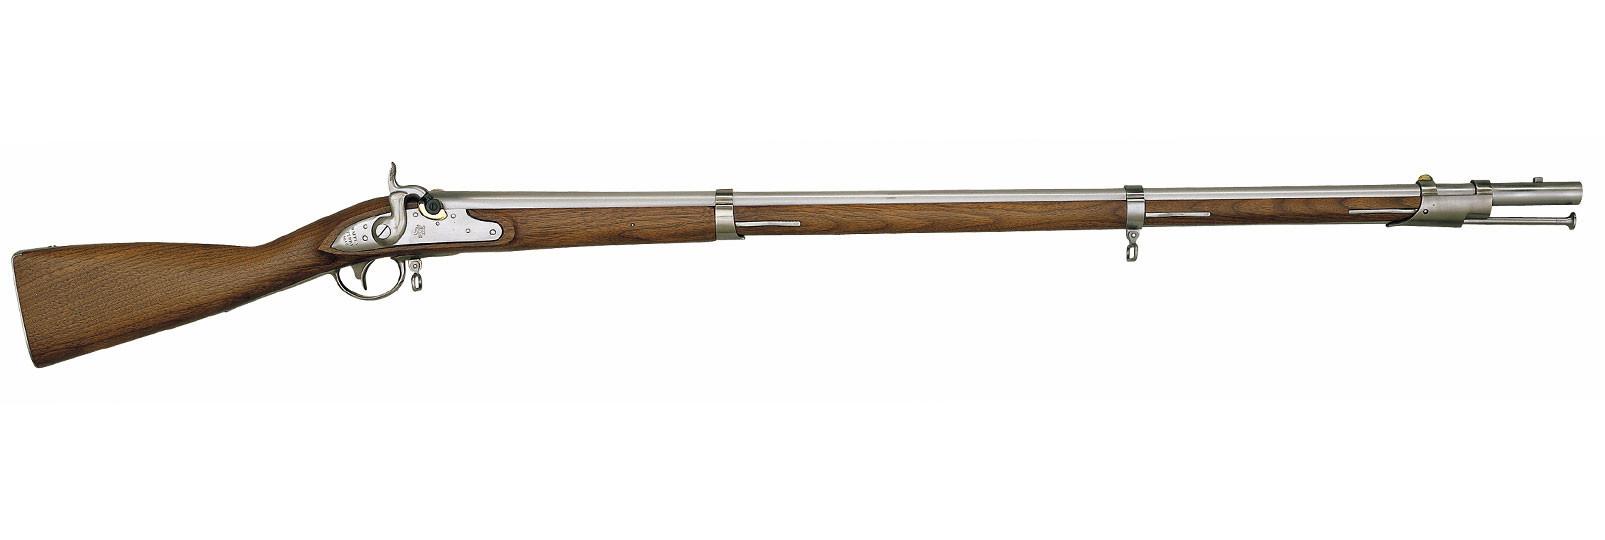 1816 Harper's Ferry Colt Conversion Rifle